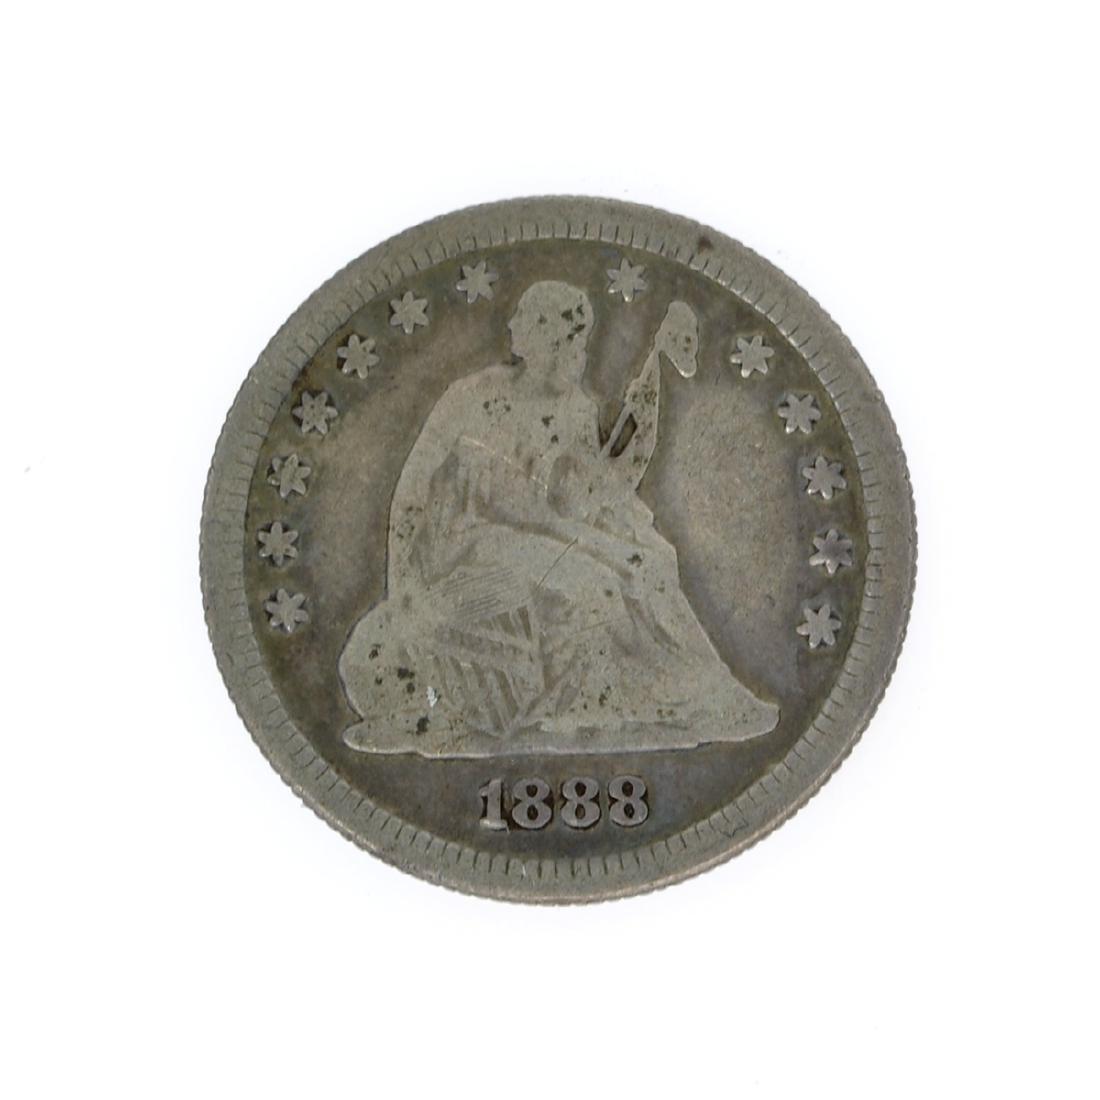 Rare 1888-S Liberty Seated Quarter Dollar Coin